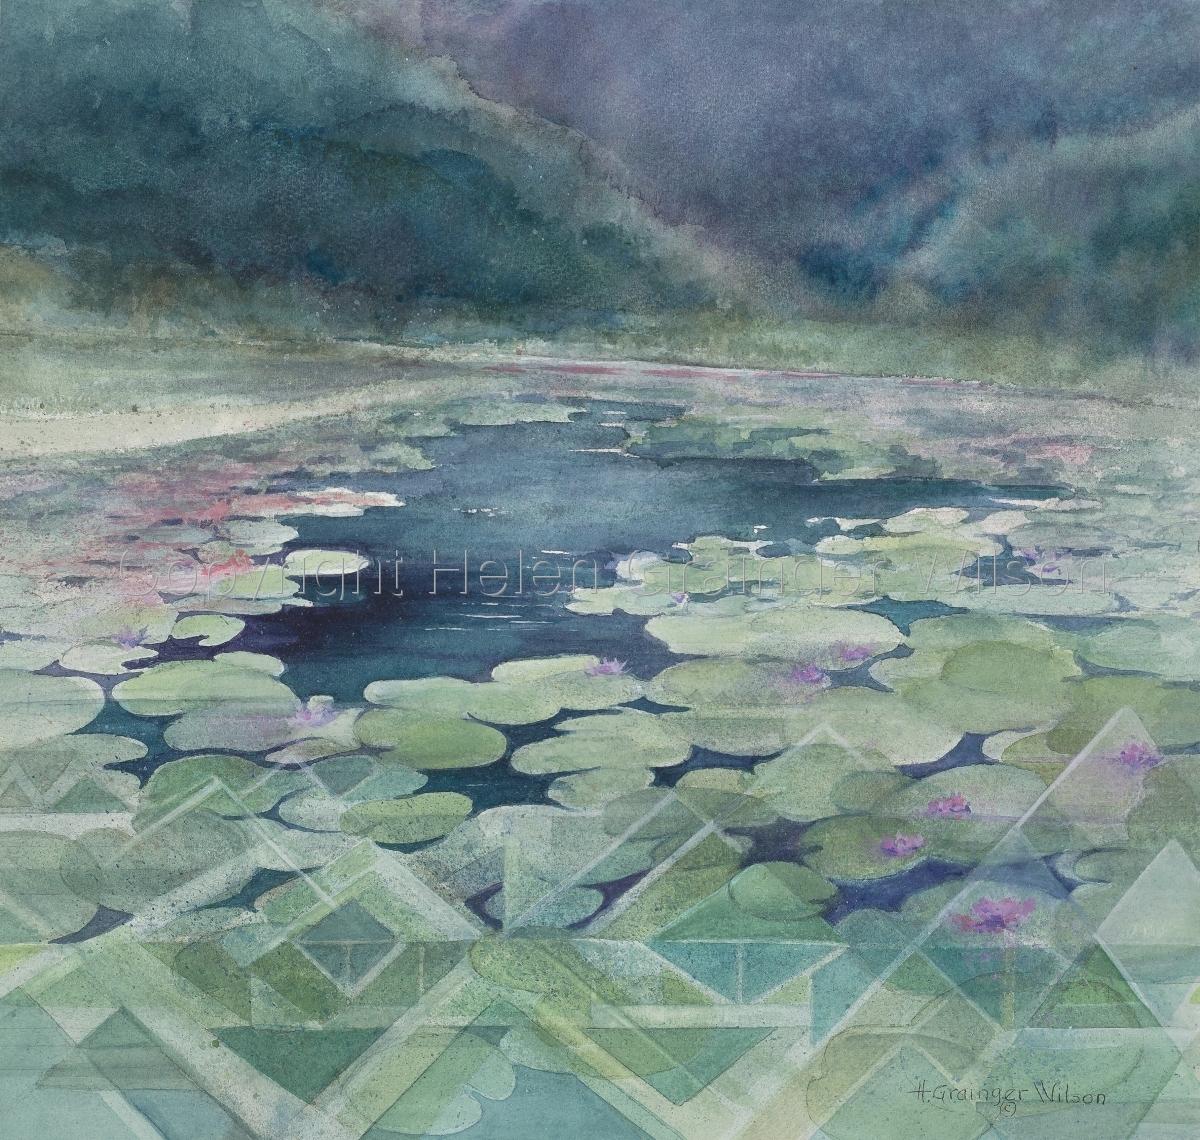 Coeur d'Alene Waterlilies by Helen Grainger Wilson (large view)